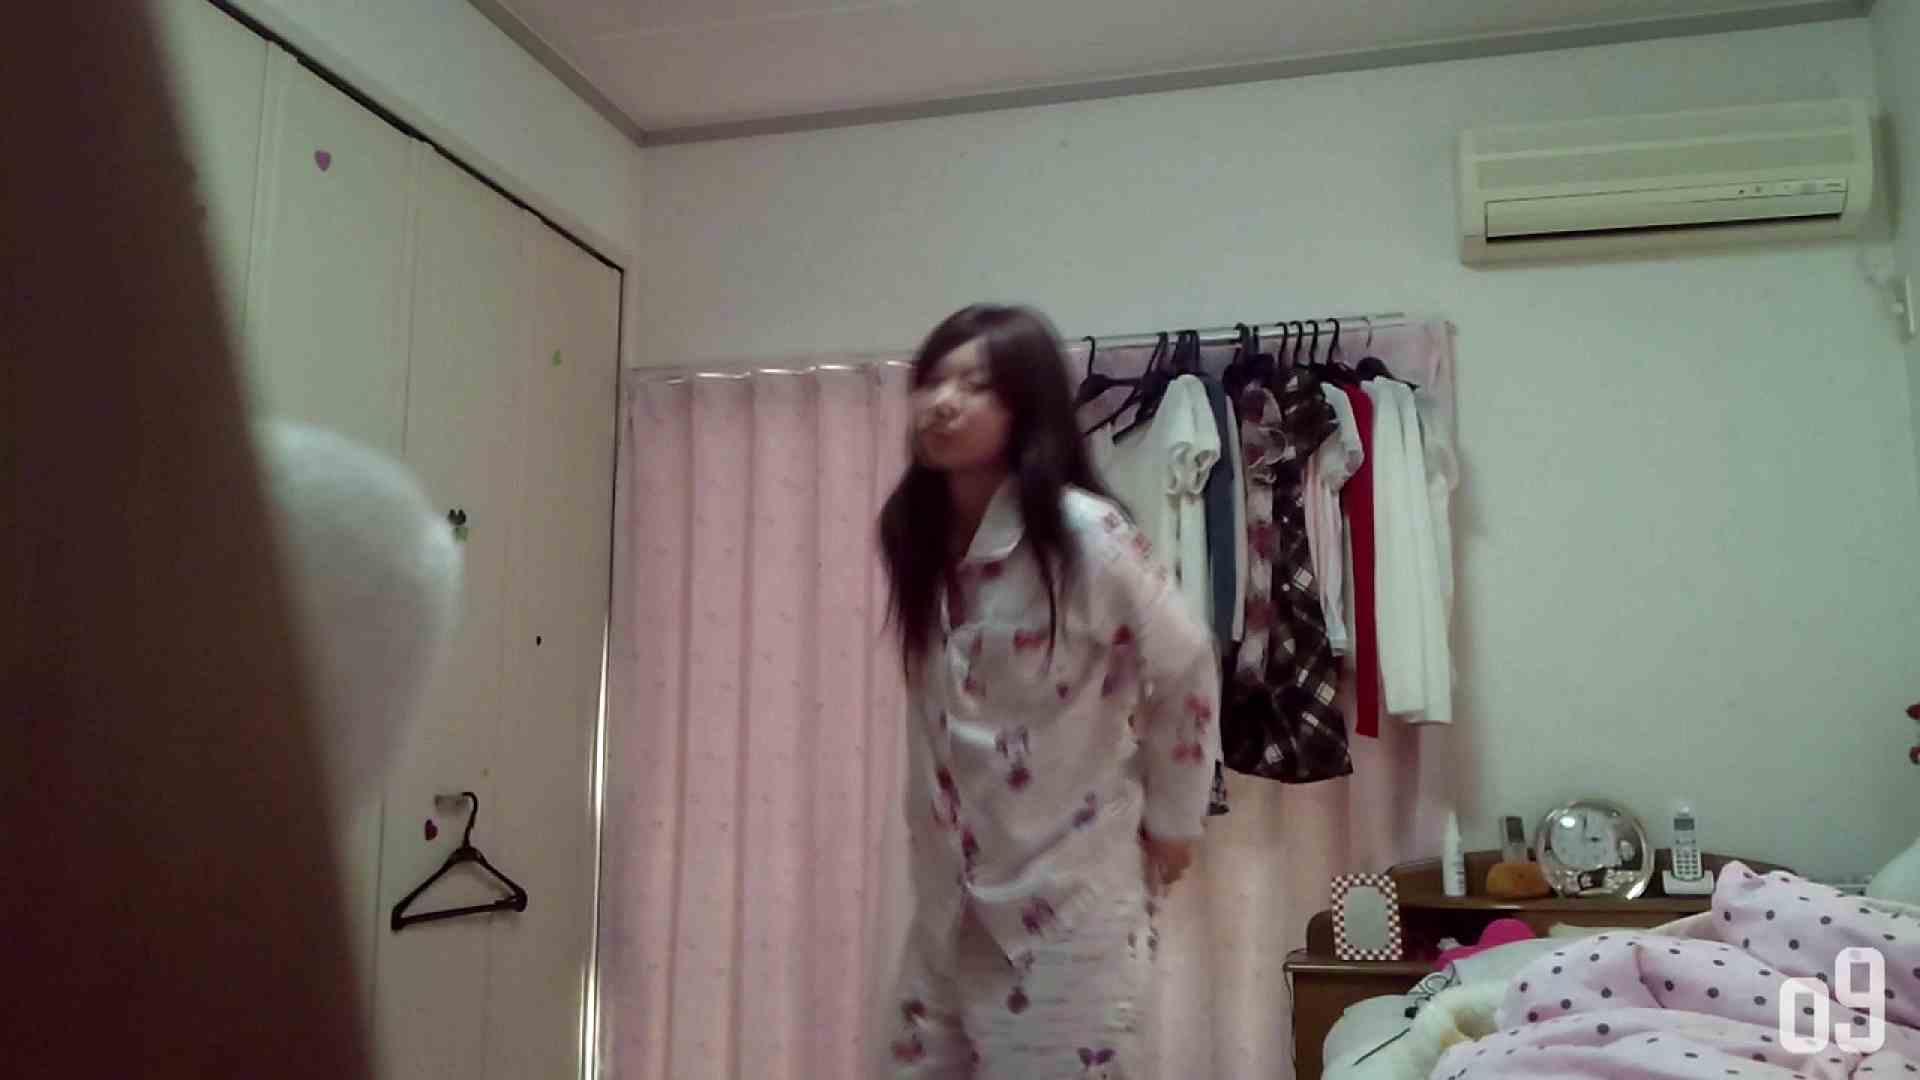 vol.2 瑞希ちゃんの自宅公開!寝起きの着替え・・・ラリルそー 美女OL  44連発 12